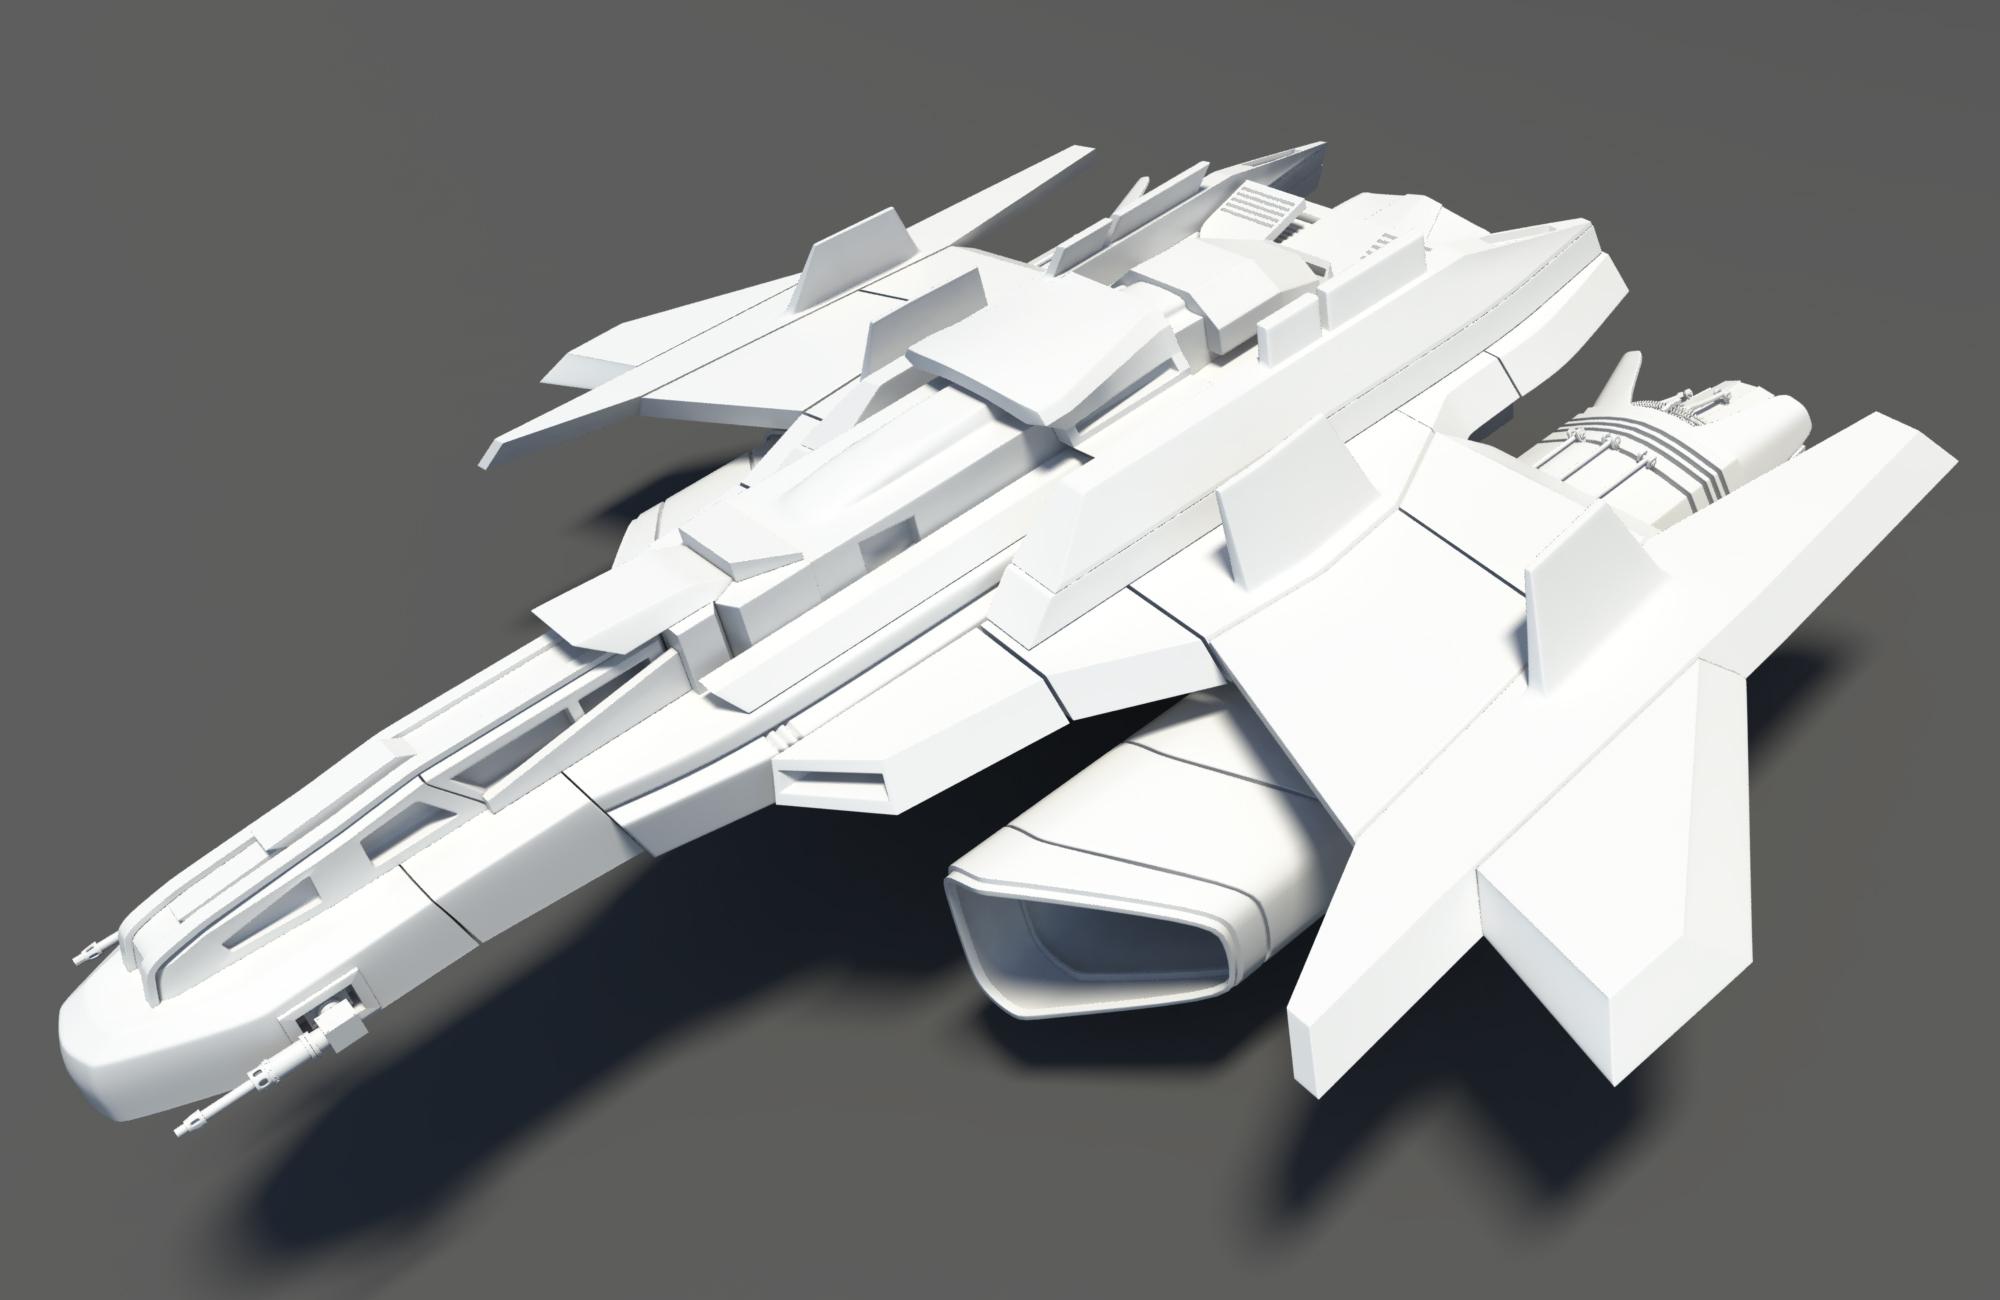 Spaceship Spacecraft Jet 3D Model